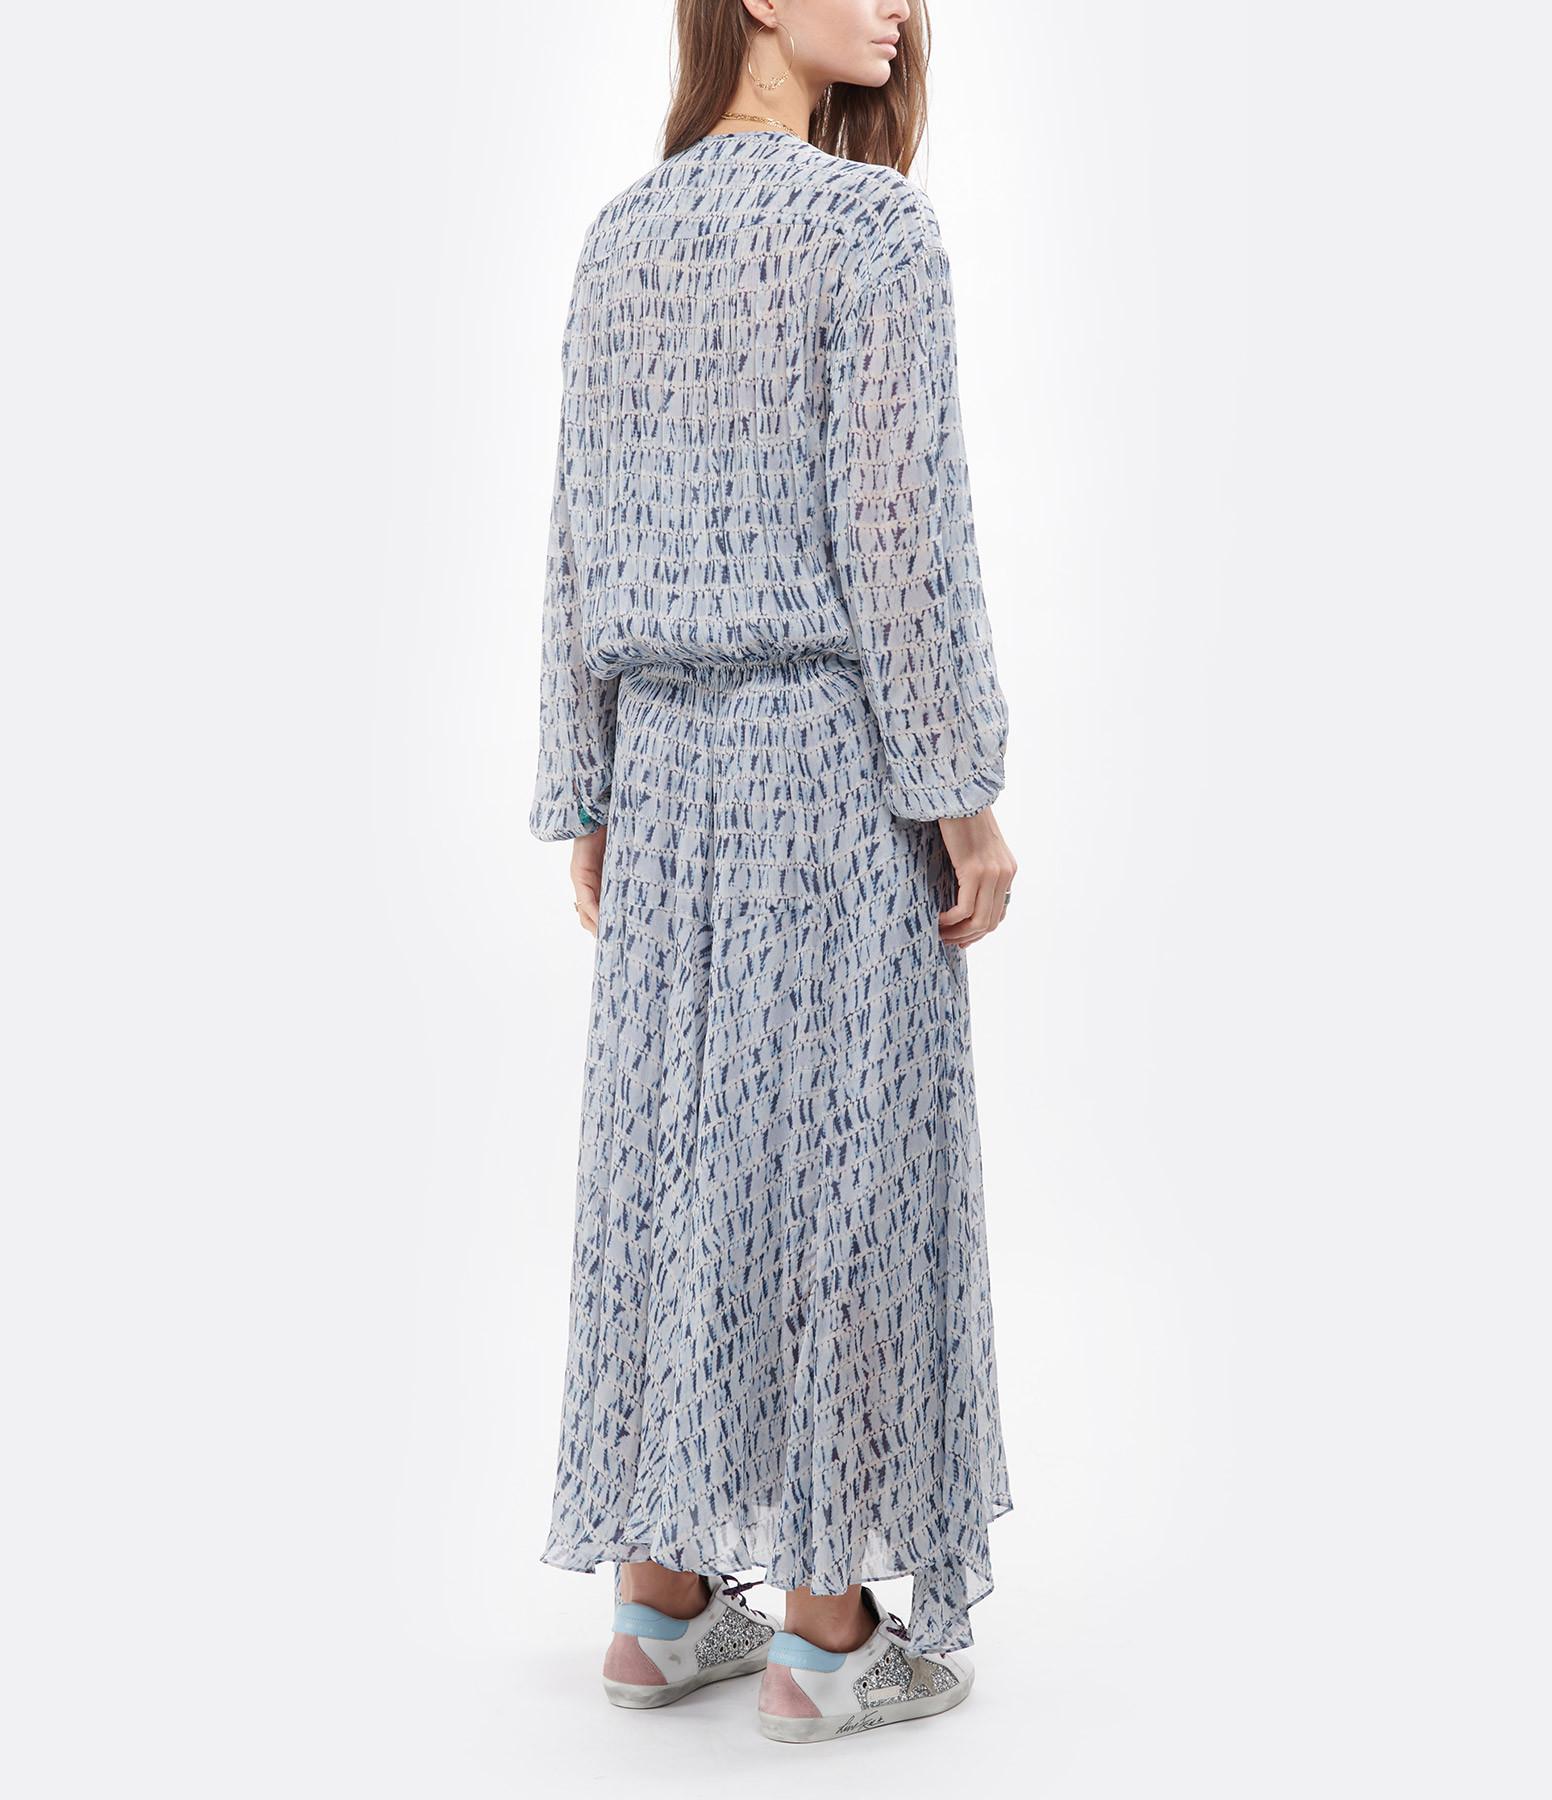 ISABEL MARANT ÉTOILE - Robe Saureli Imprimé Bleu